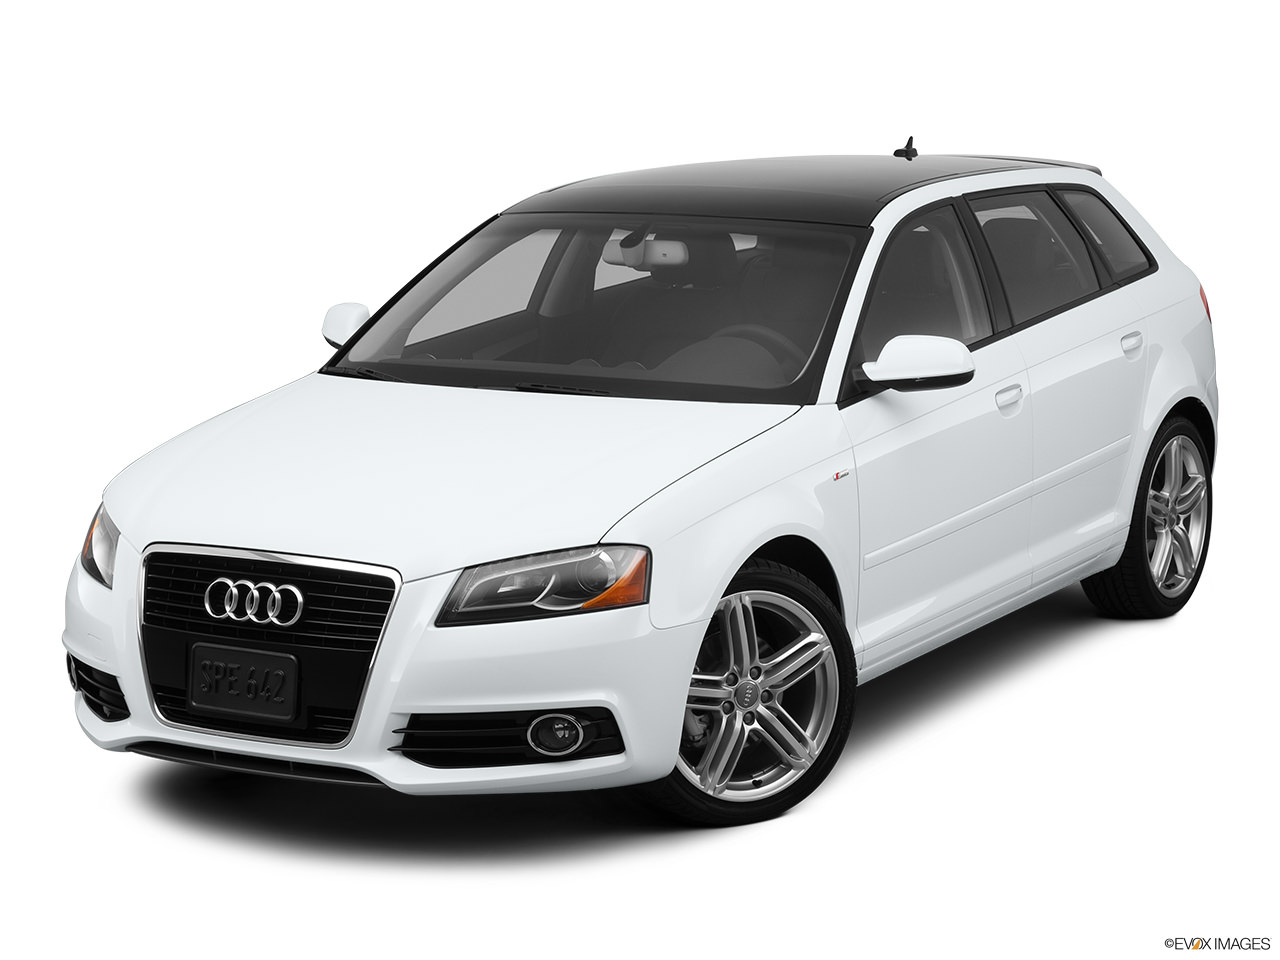 Audi A3 TDI 2012